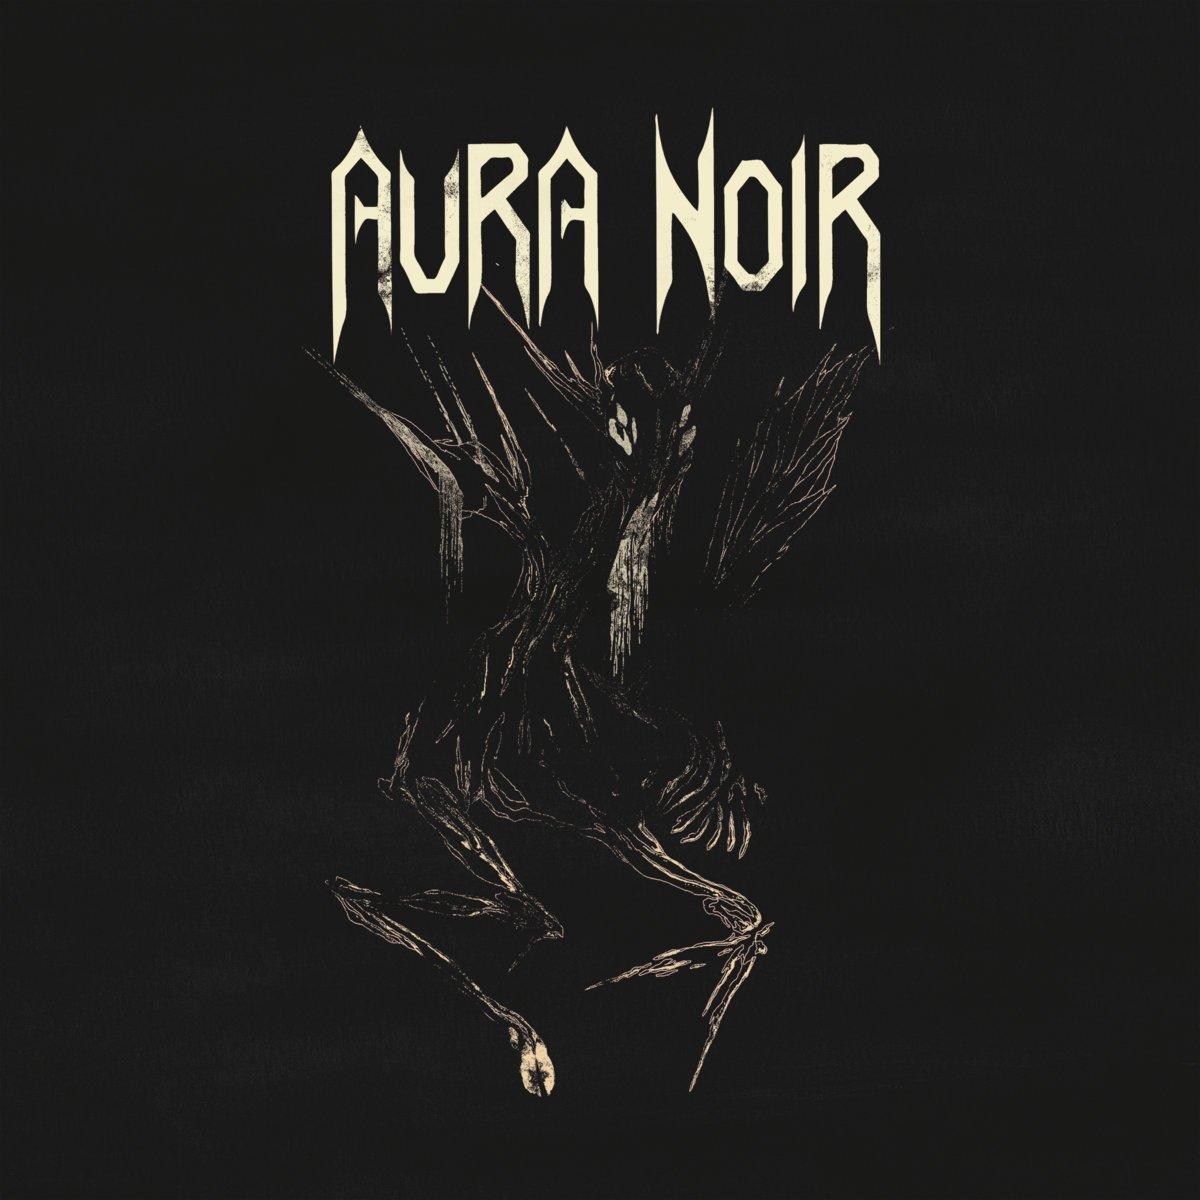 CD : Aura Noir - Aura Noire (United Kingdom - Import)